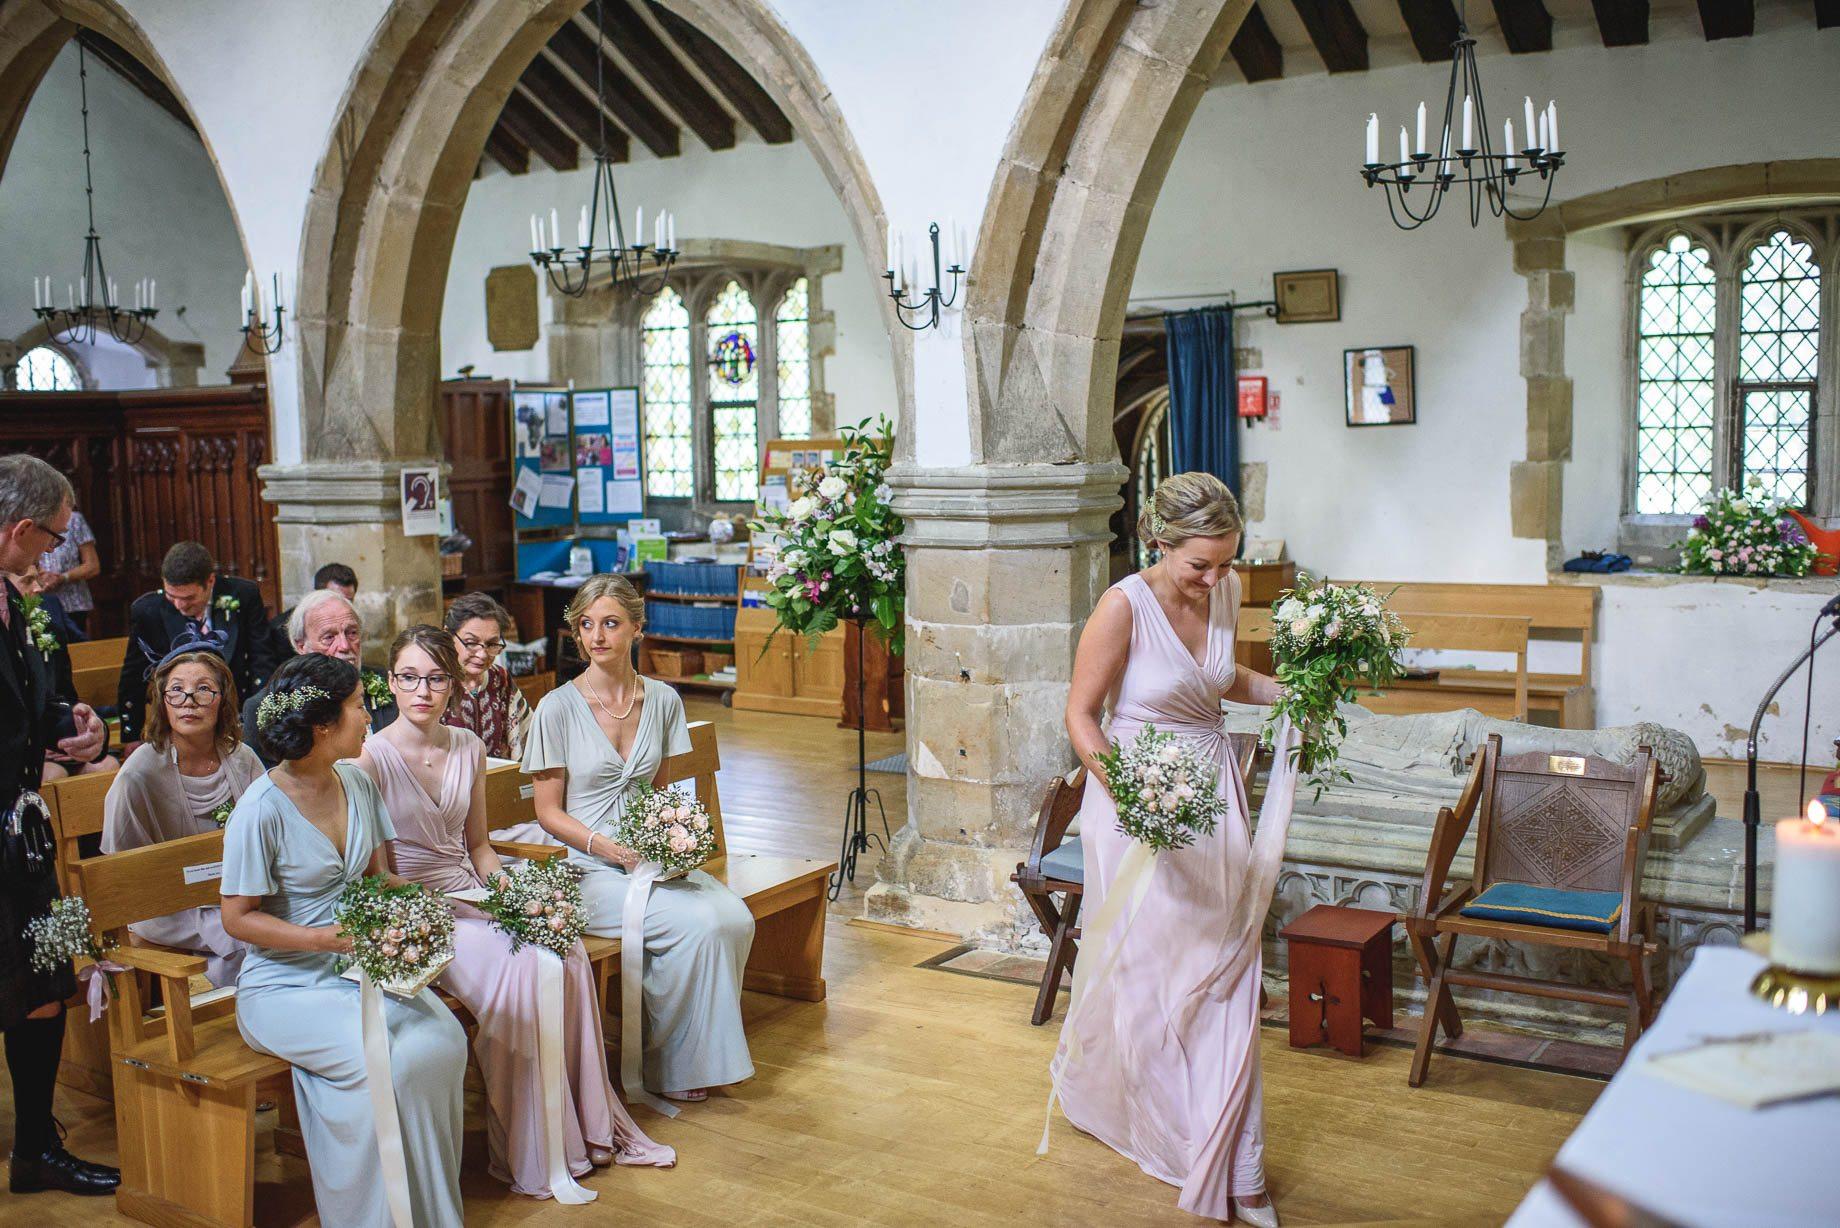 Gildings Barn wedding photography - Sarah and Steve (54 of 190)